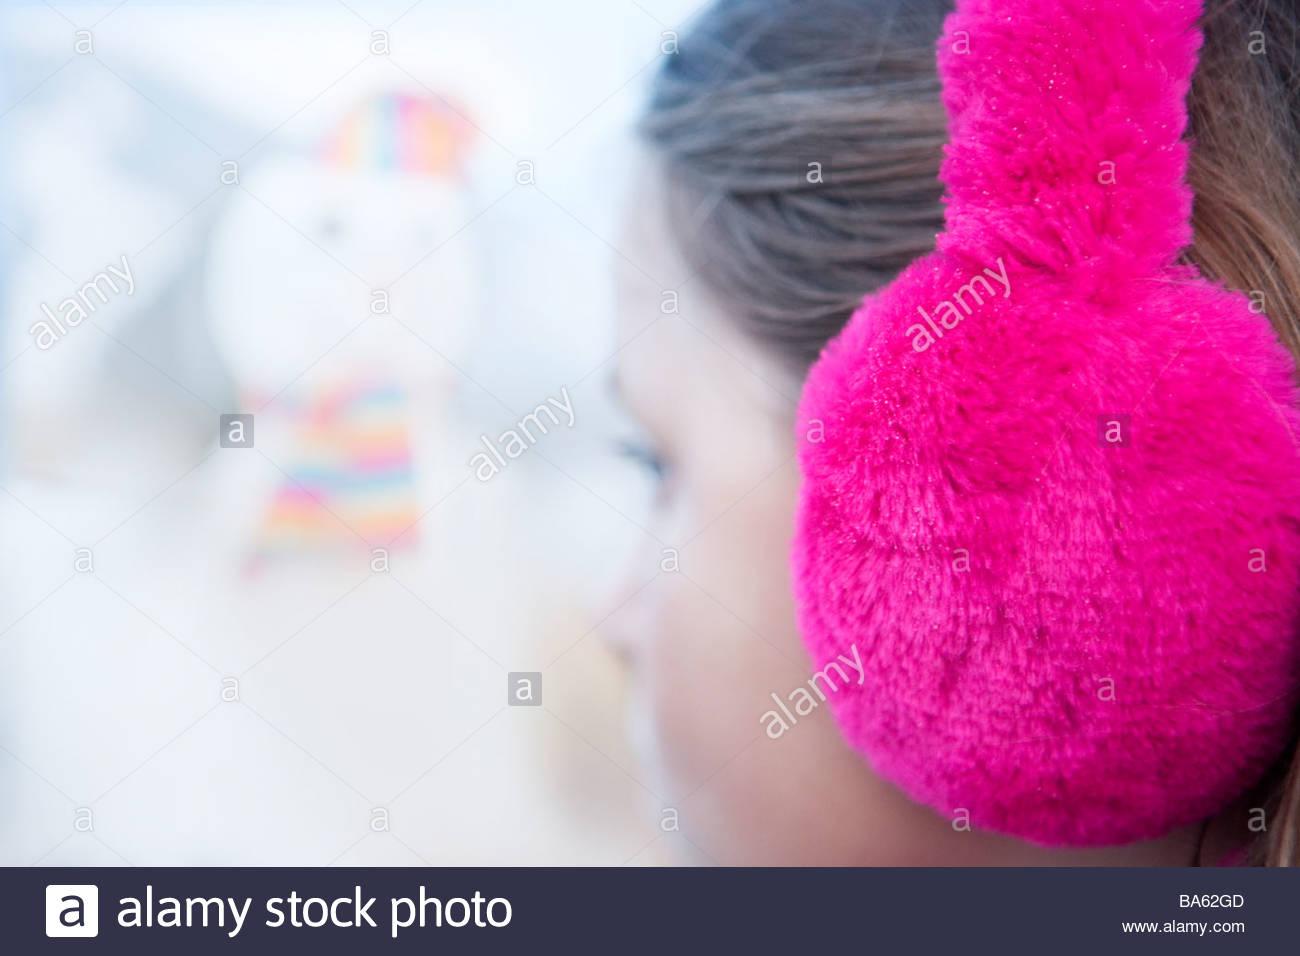 Close up of girl wearing bright pink earmuffs - Stock Image